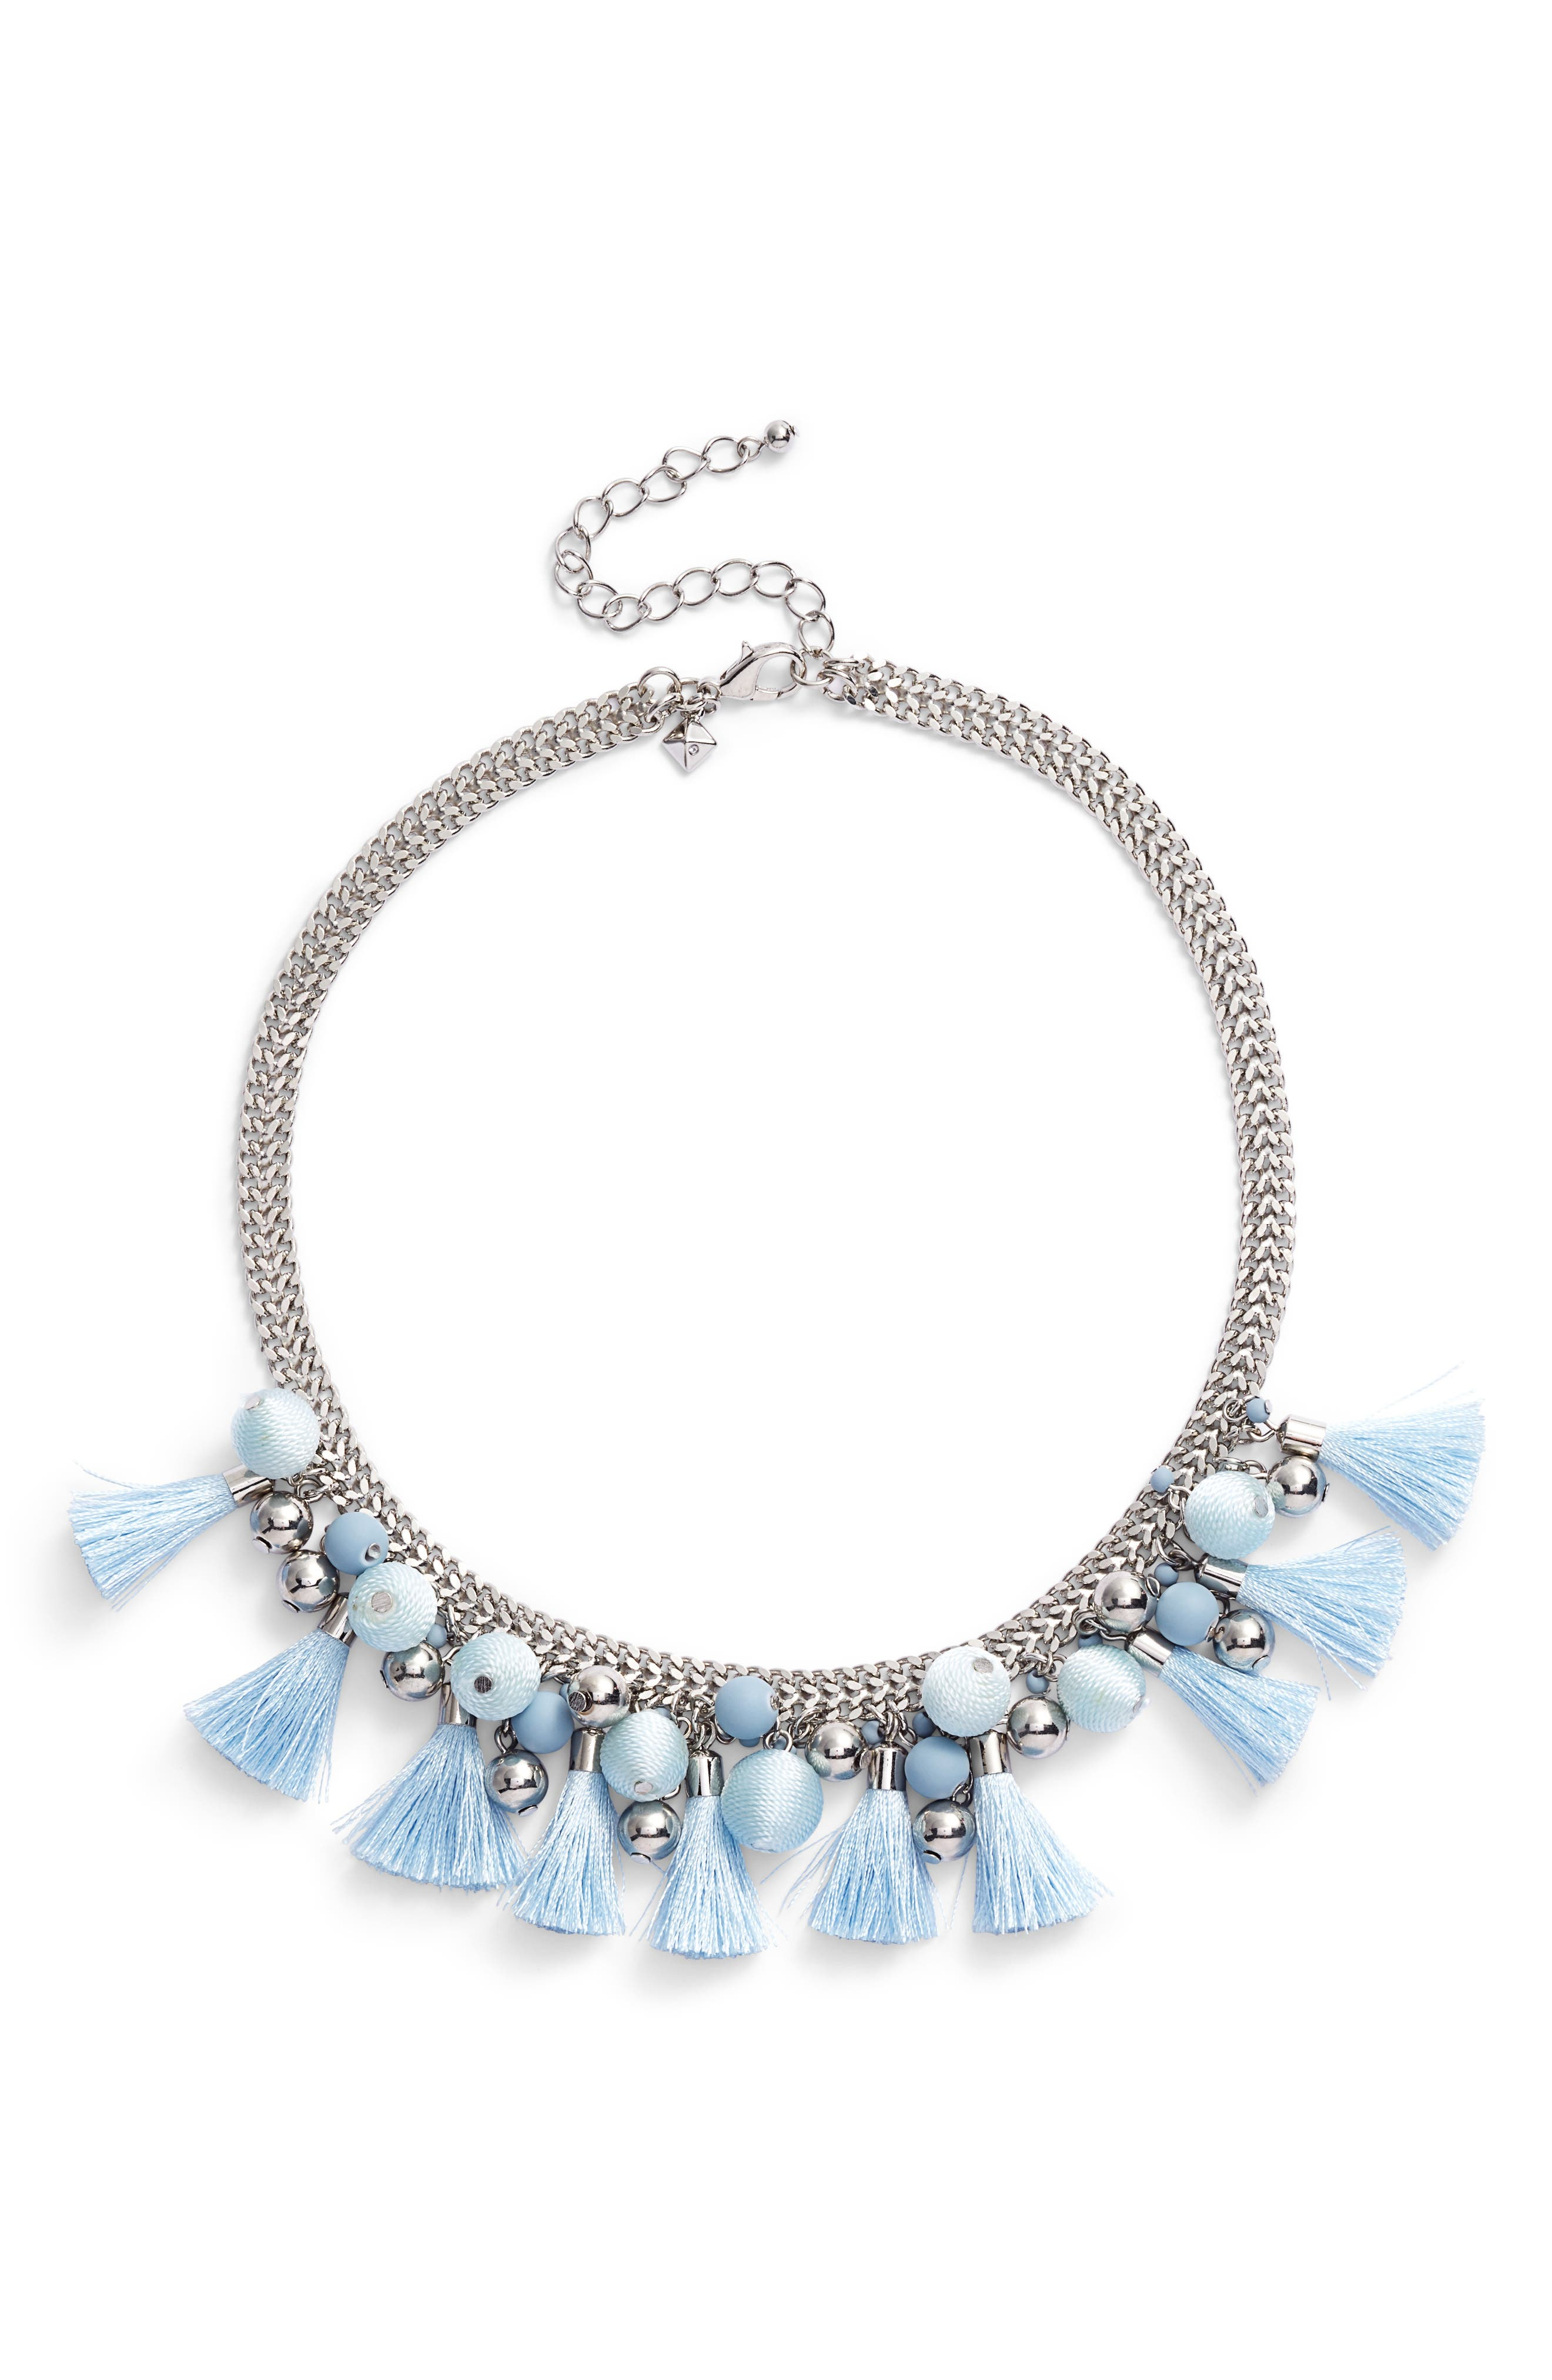 Bauble & Tassel Collar Necklace,                             Main thumbnail 1, color,                             040